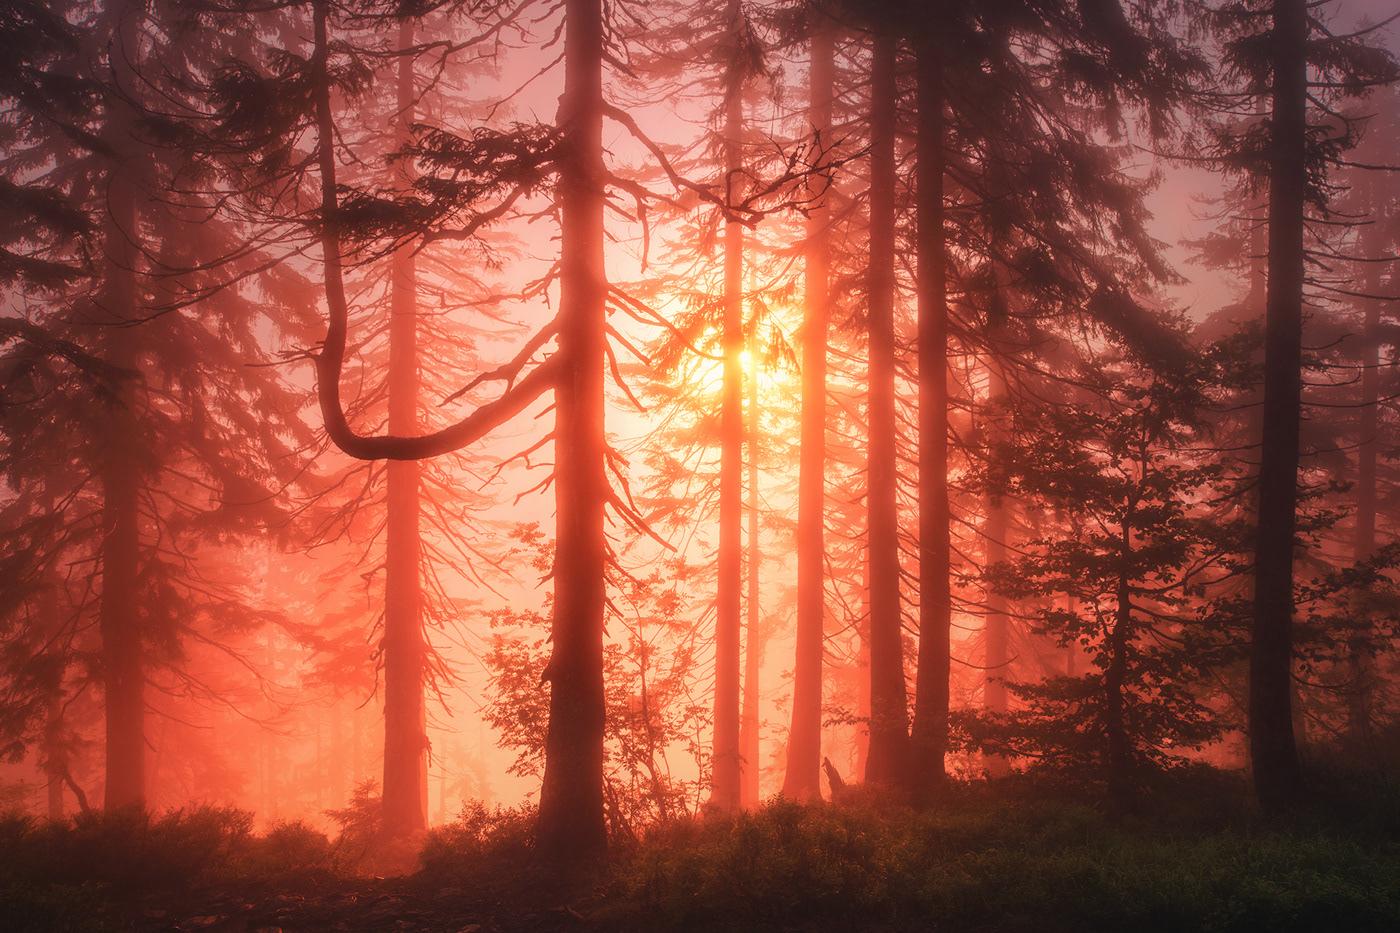 Bavaria Bayern Deutschland fog forest germany nebel wald wood